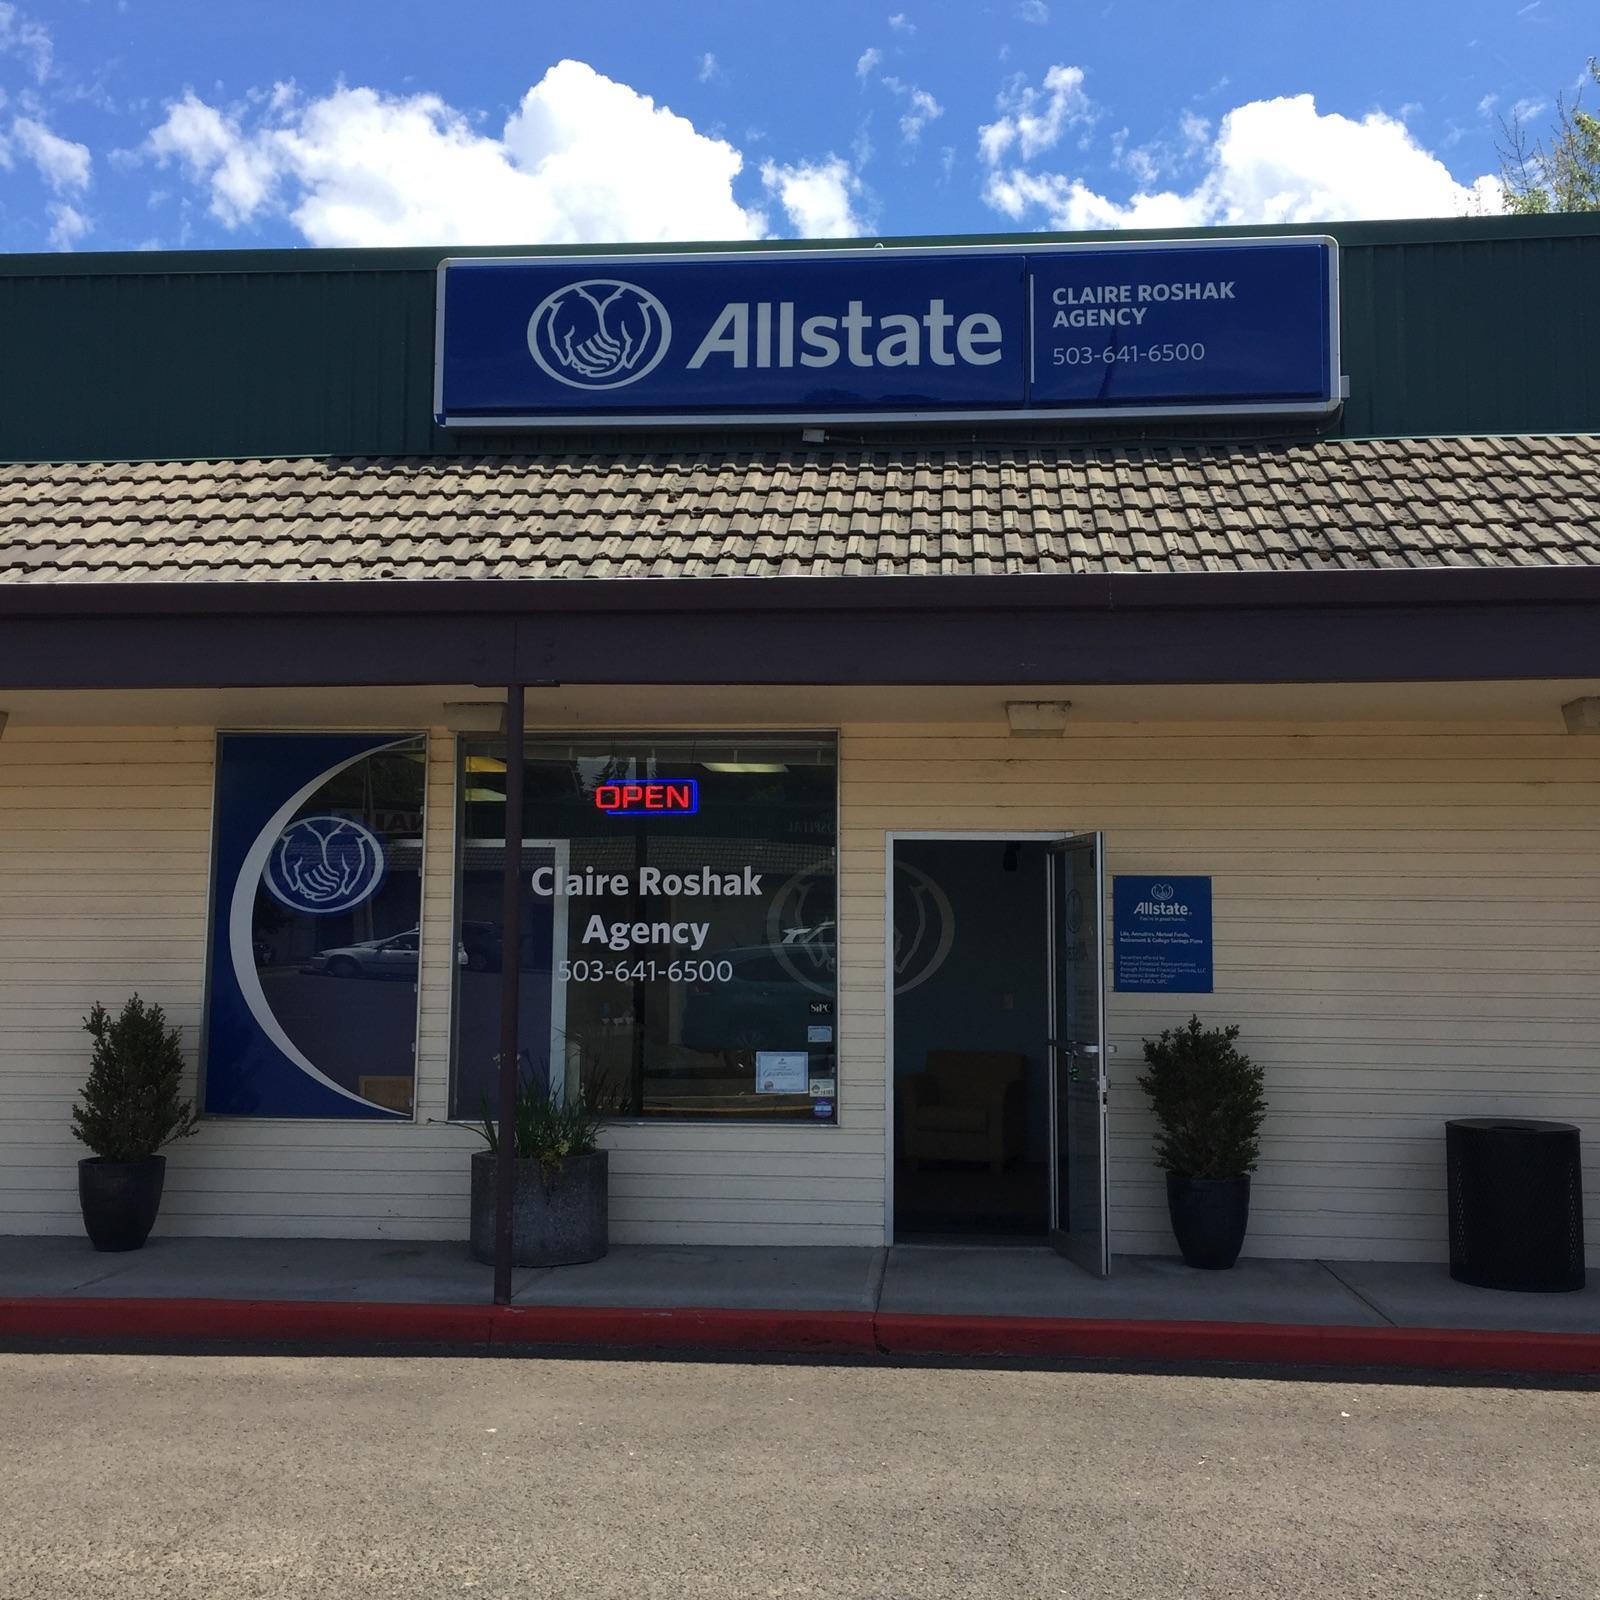 Allstate Insurance Agent: Claire Roshak image 1